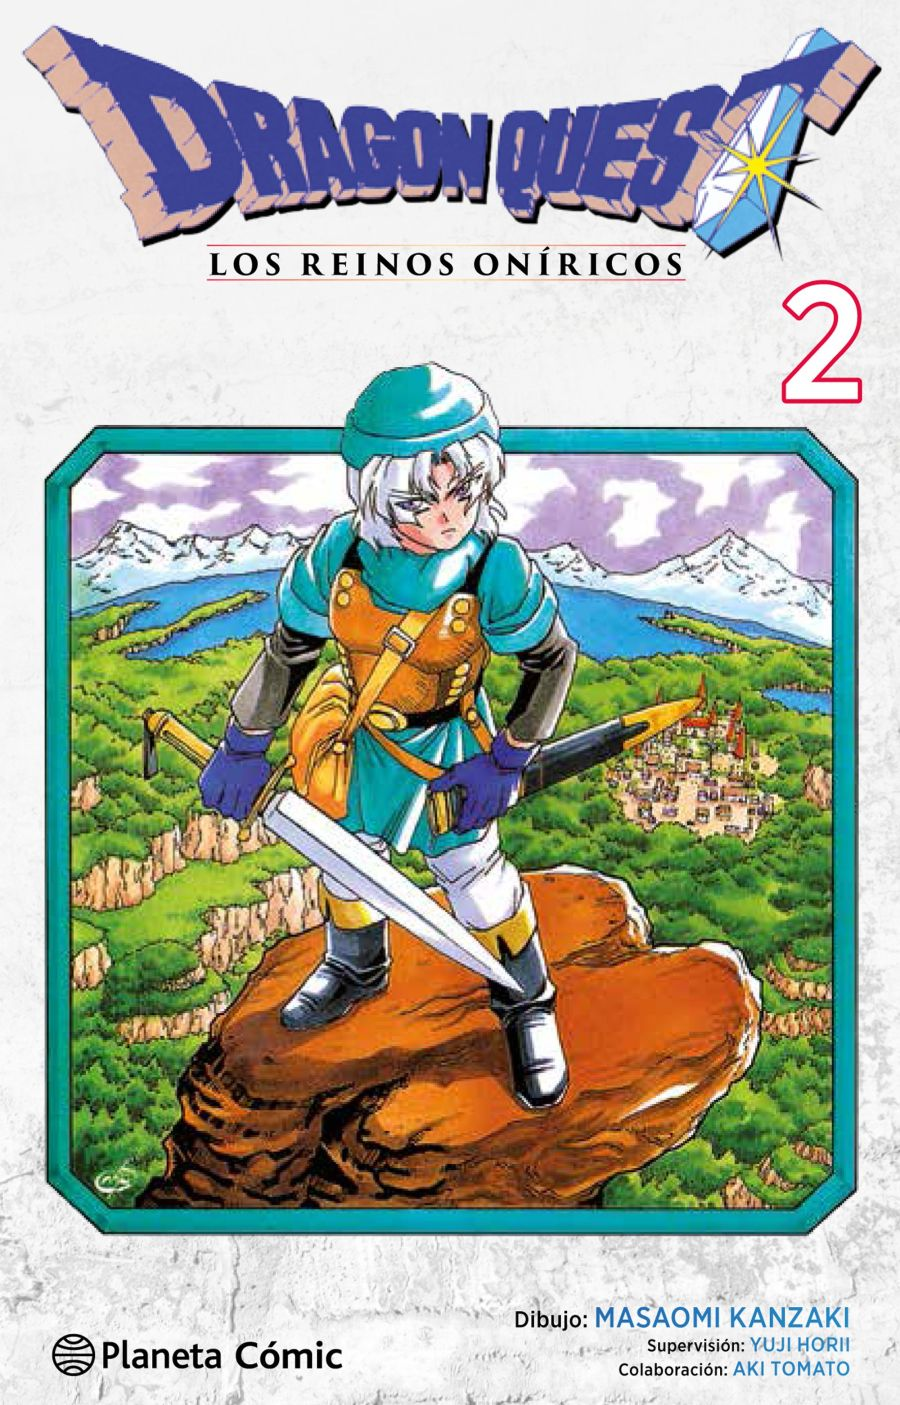 dq los reinos oniricos 2